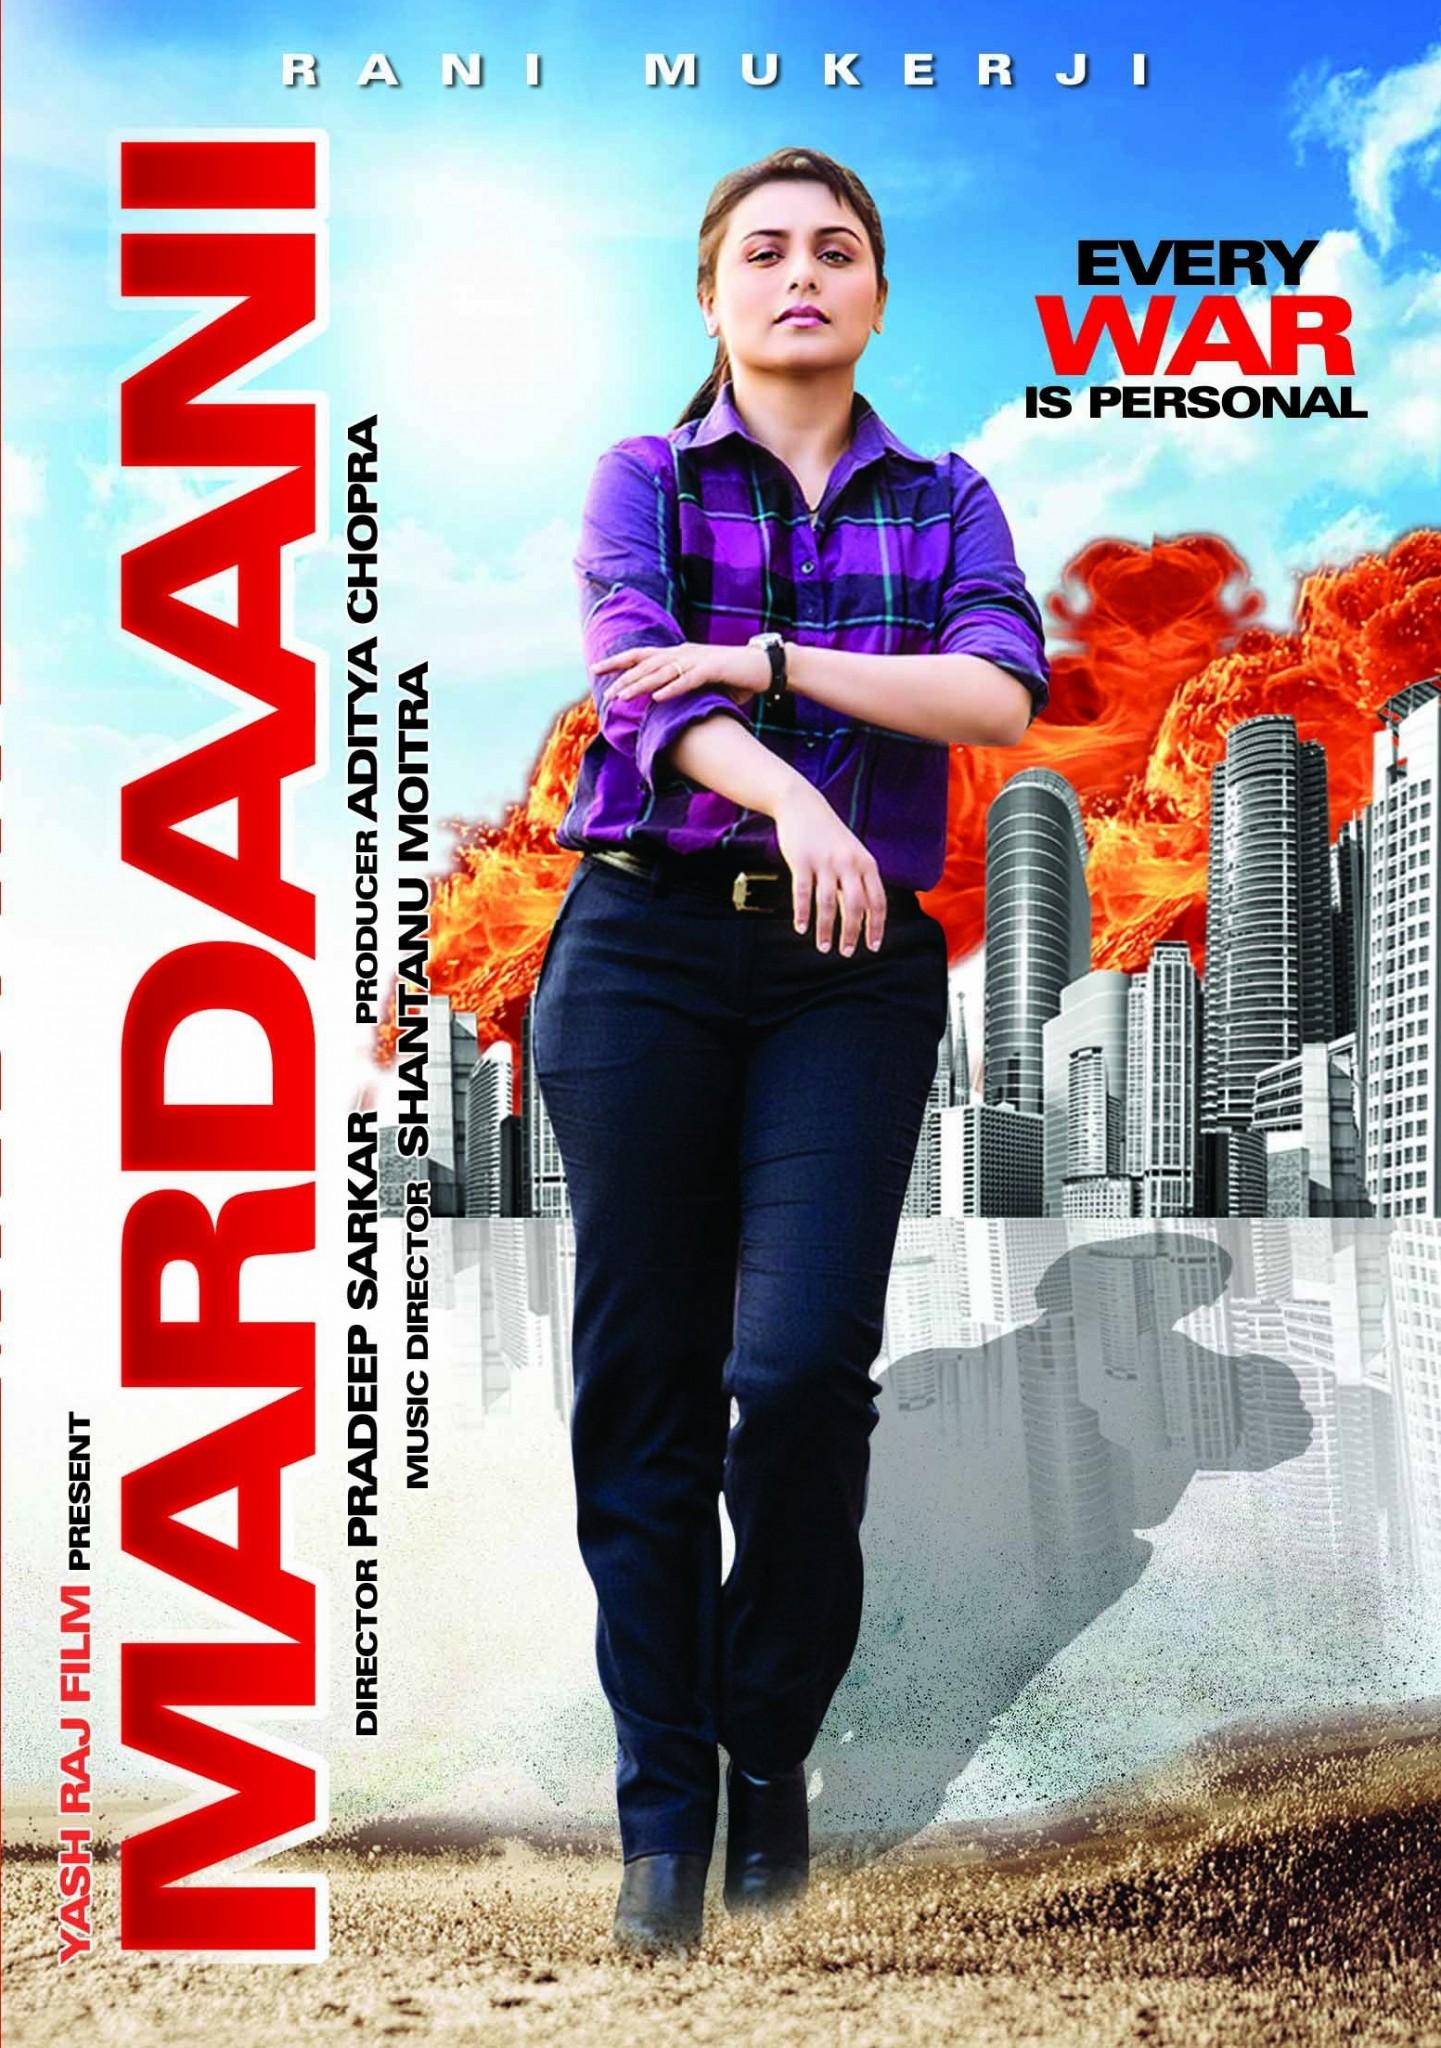 Mardaani Movie Poster Full HD Desktop Wallpaper Rani Mukerji